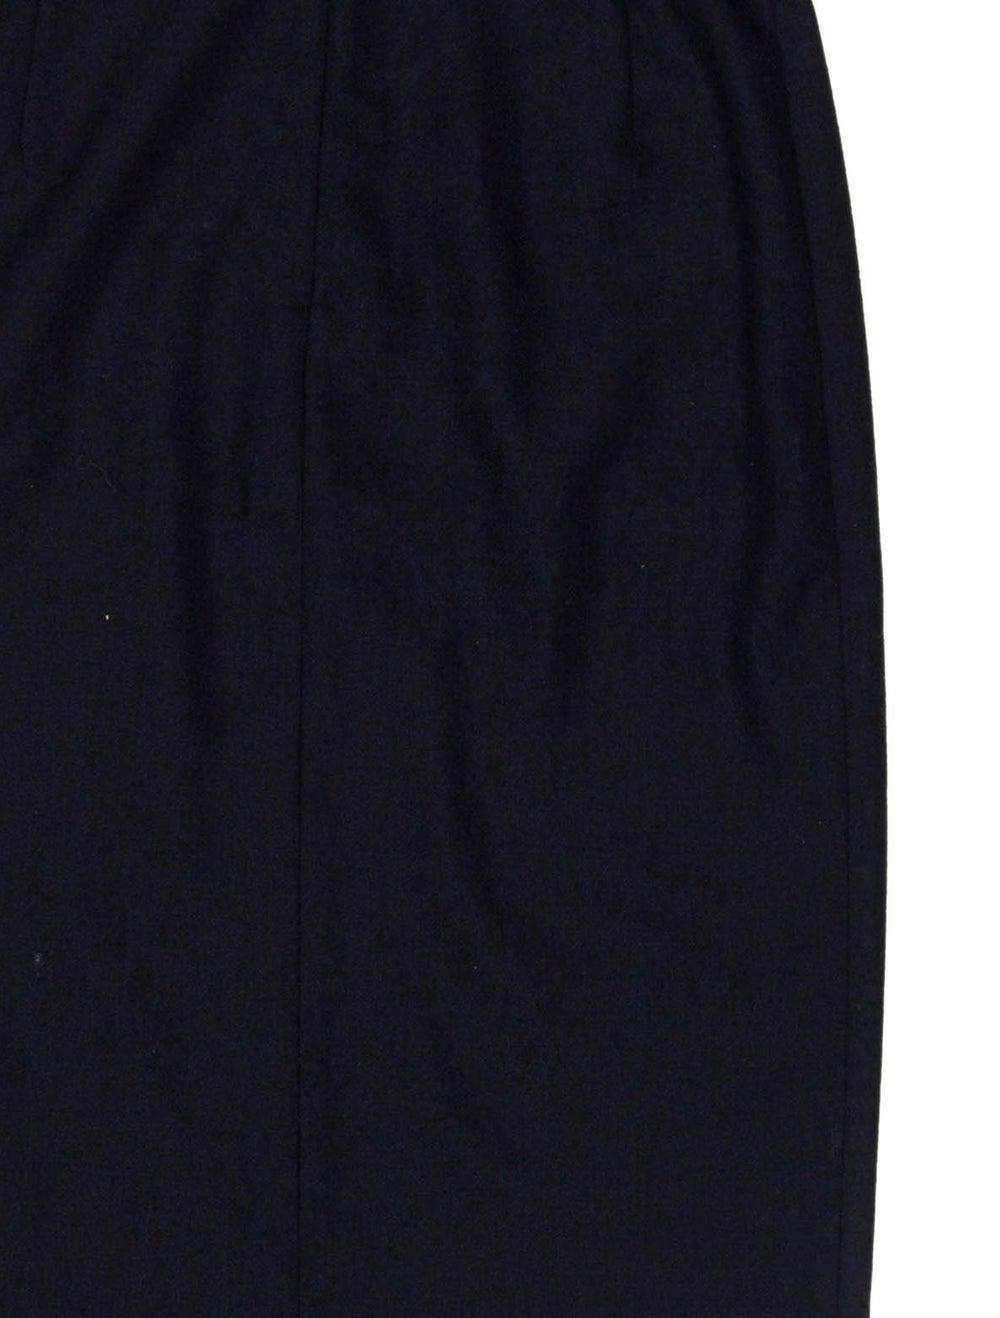 Altuzarra Midi Skirt Navy - image 3